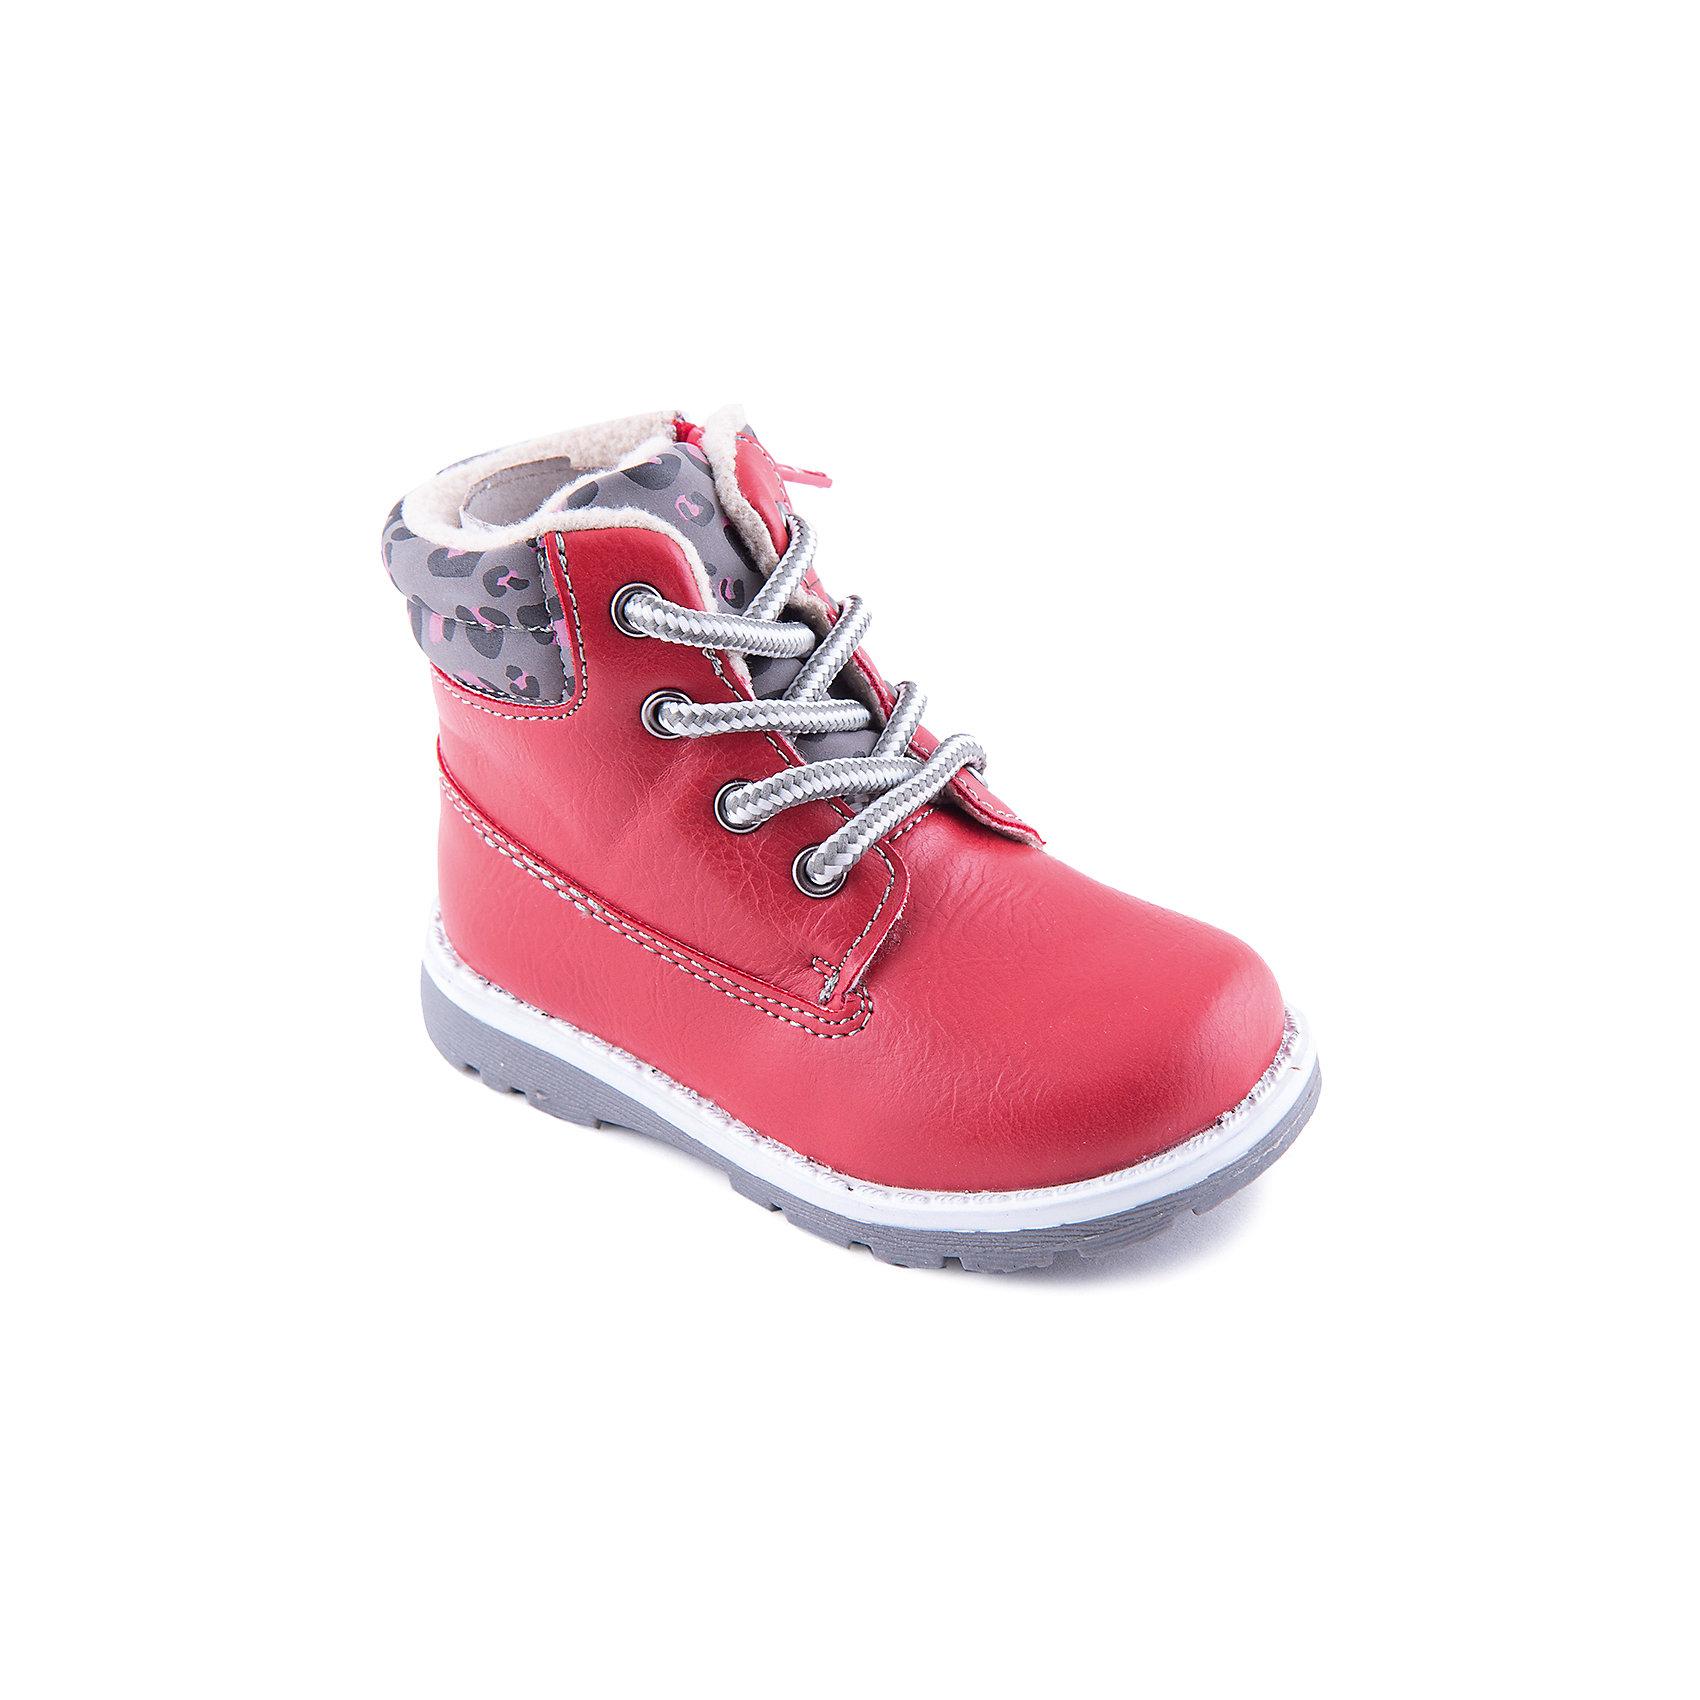 Indigo kids Ботинки для мальчика Indigo kids indigo kids обувь официальный сайт